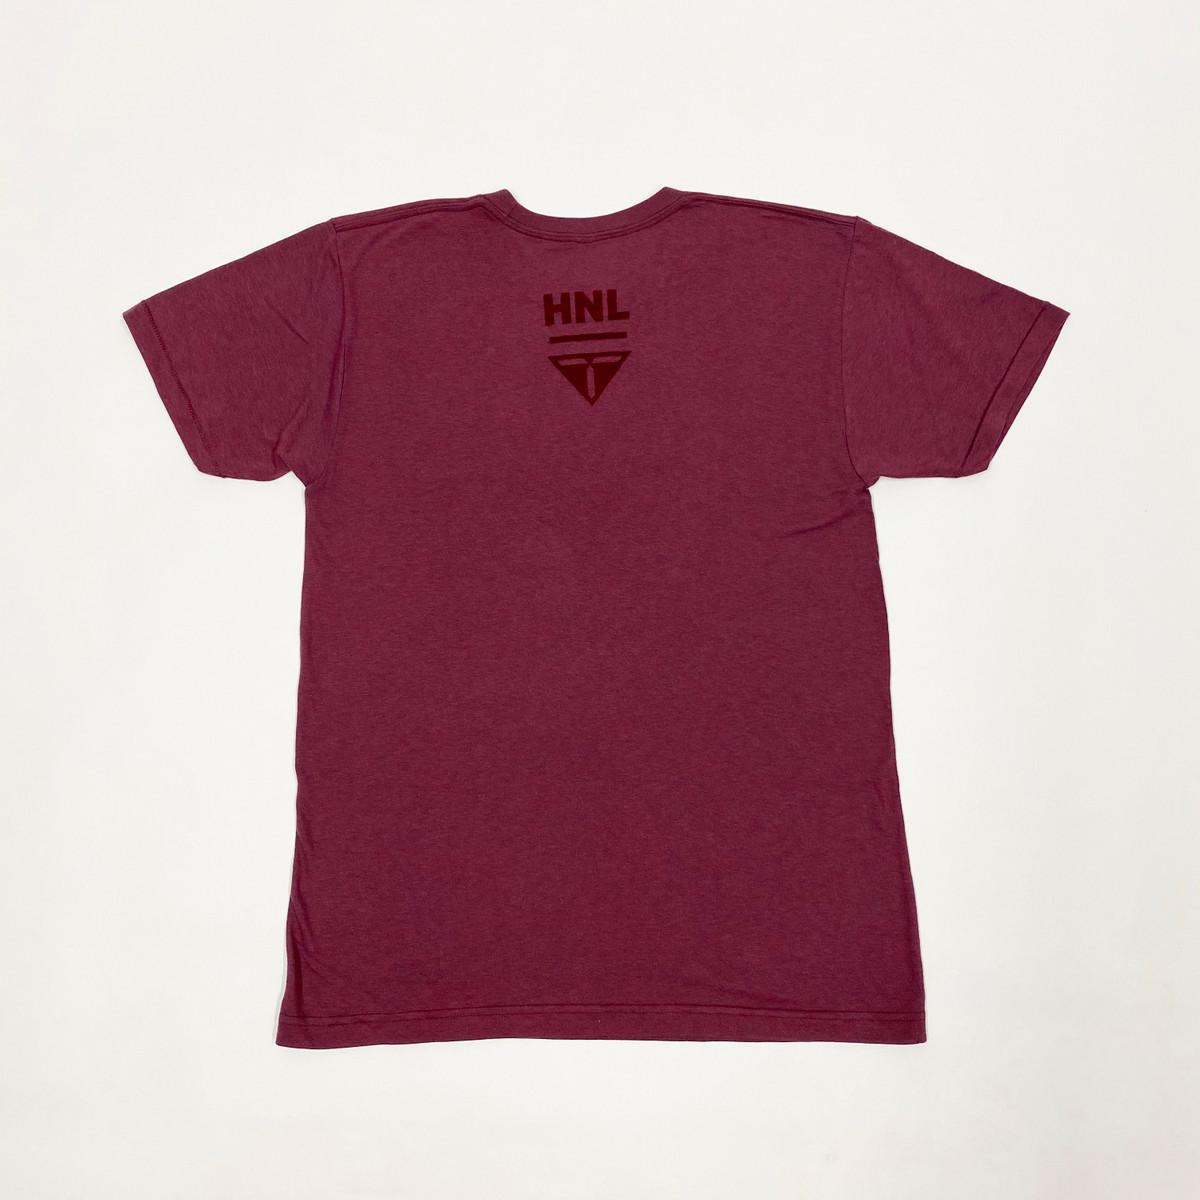 Truest Arc Velvet T-shirt Cranberry